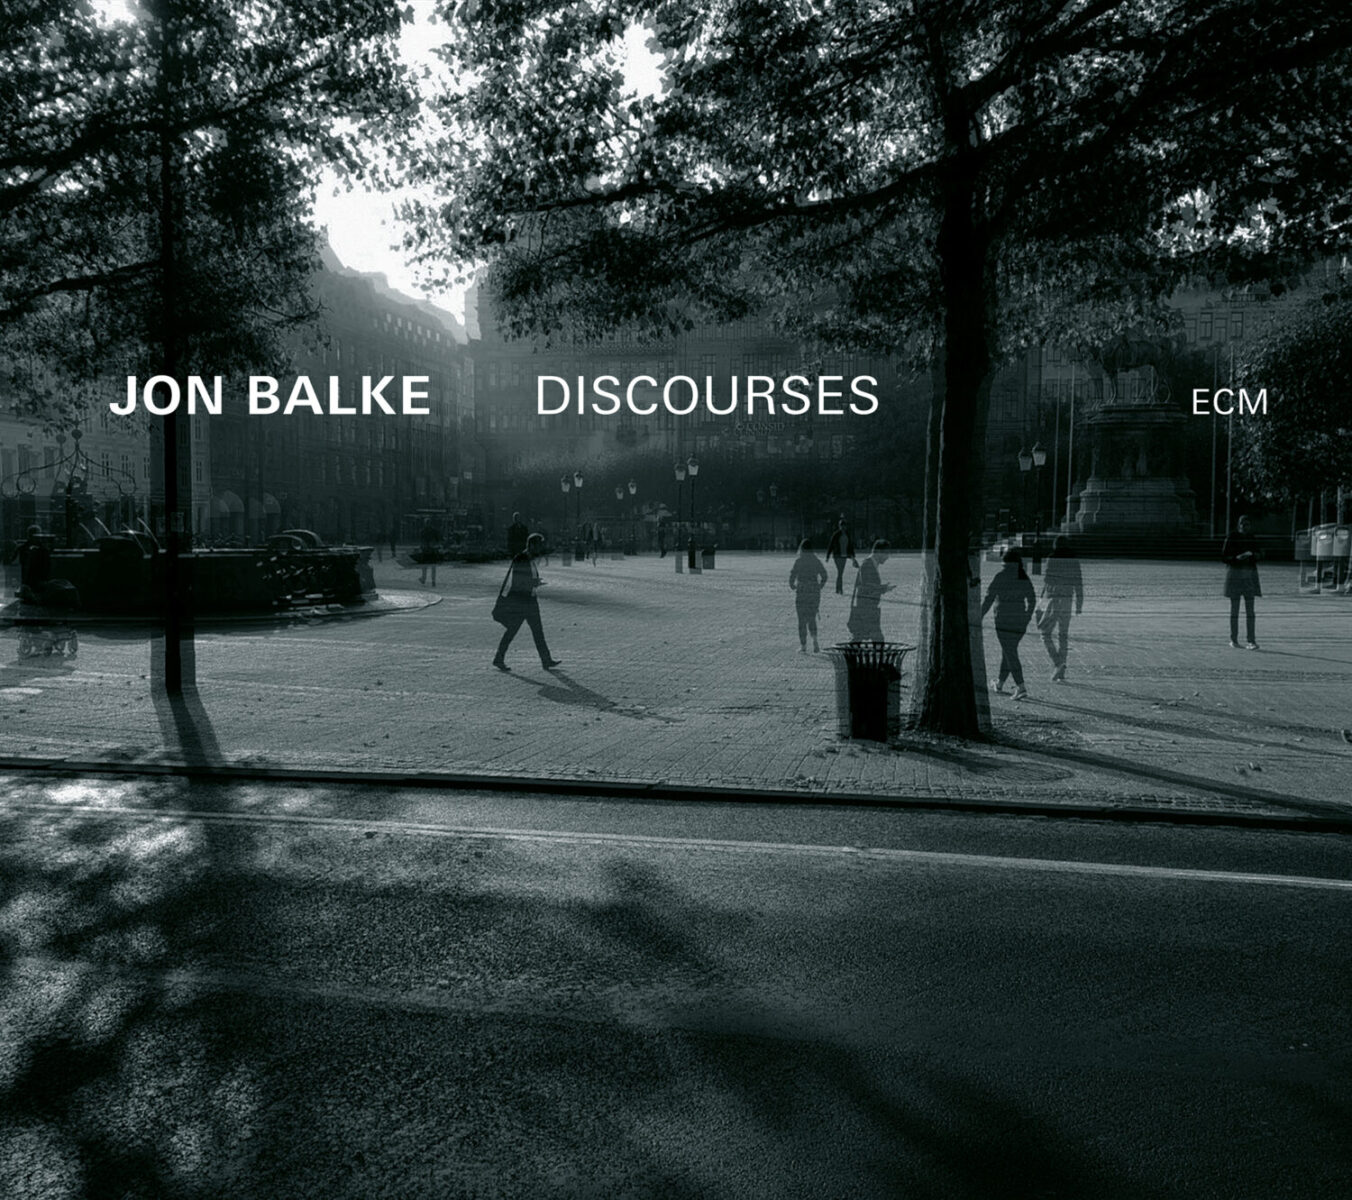 Jon Balke Discourses